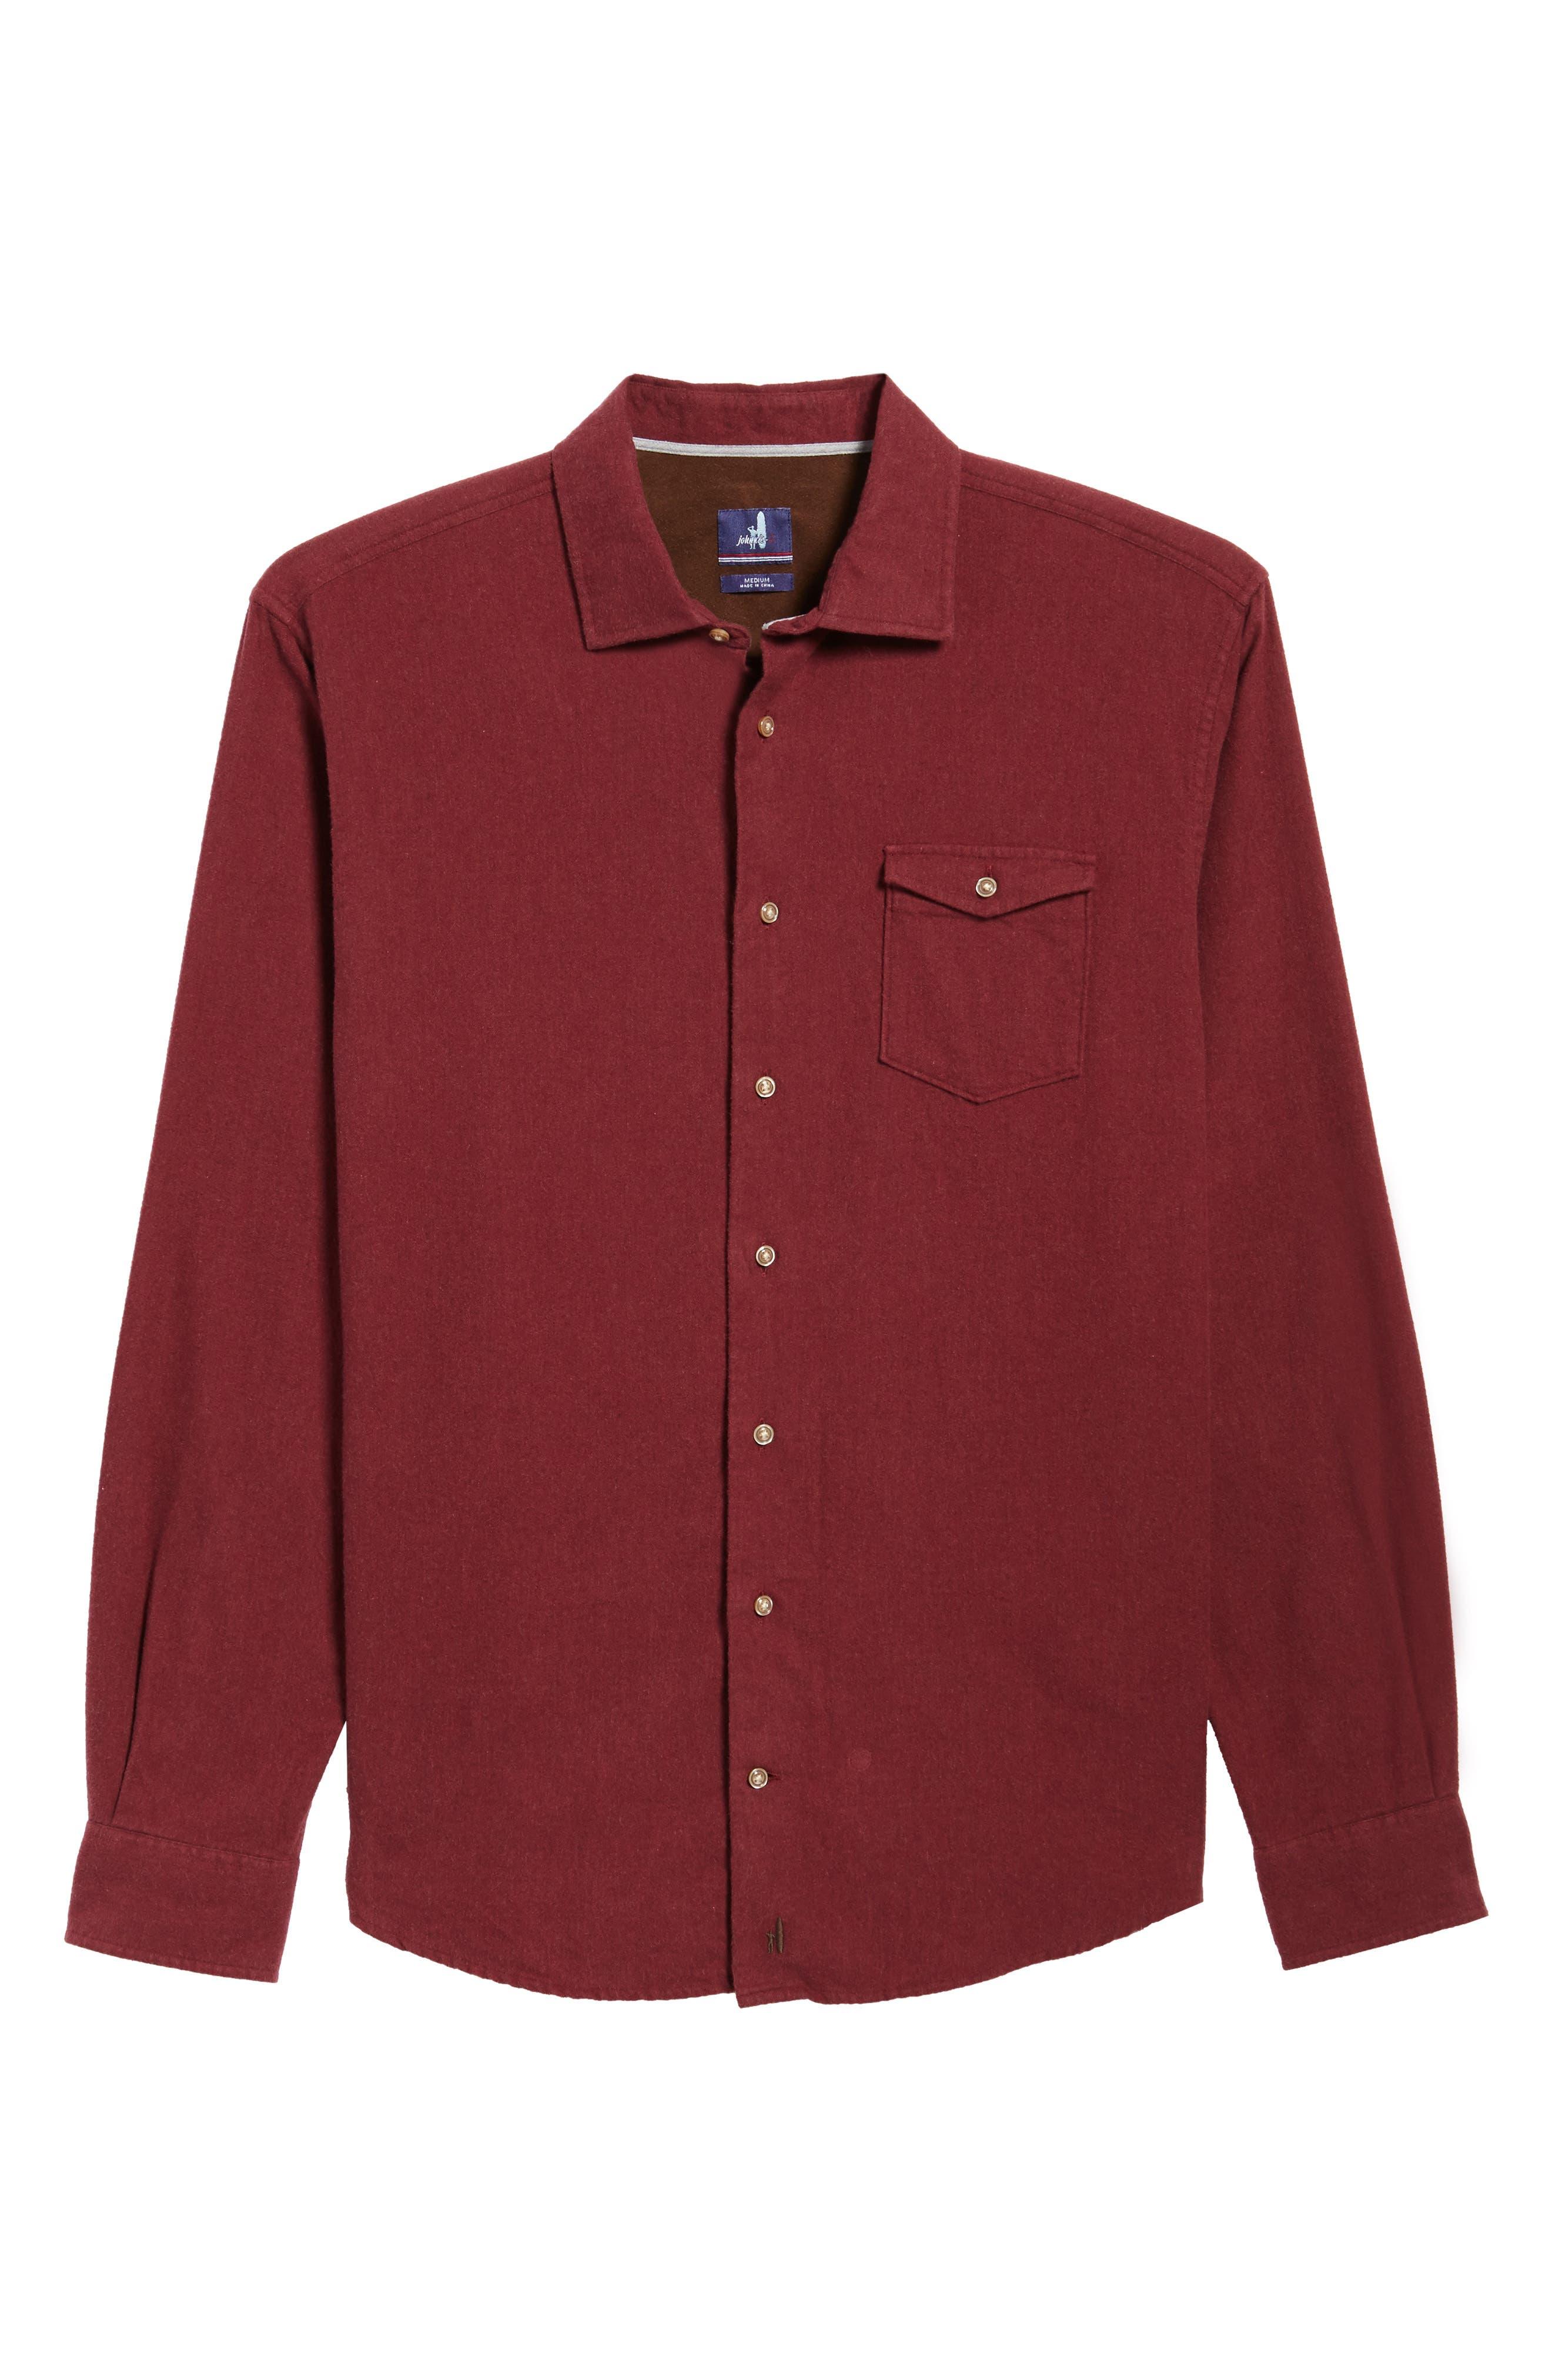 Patch Classic Fit Sport Shirt,                             Alternate thumbnail 6, color,                             934